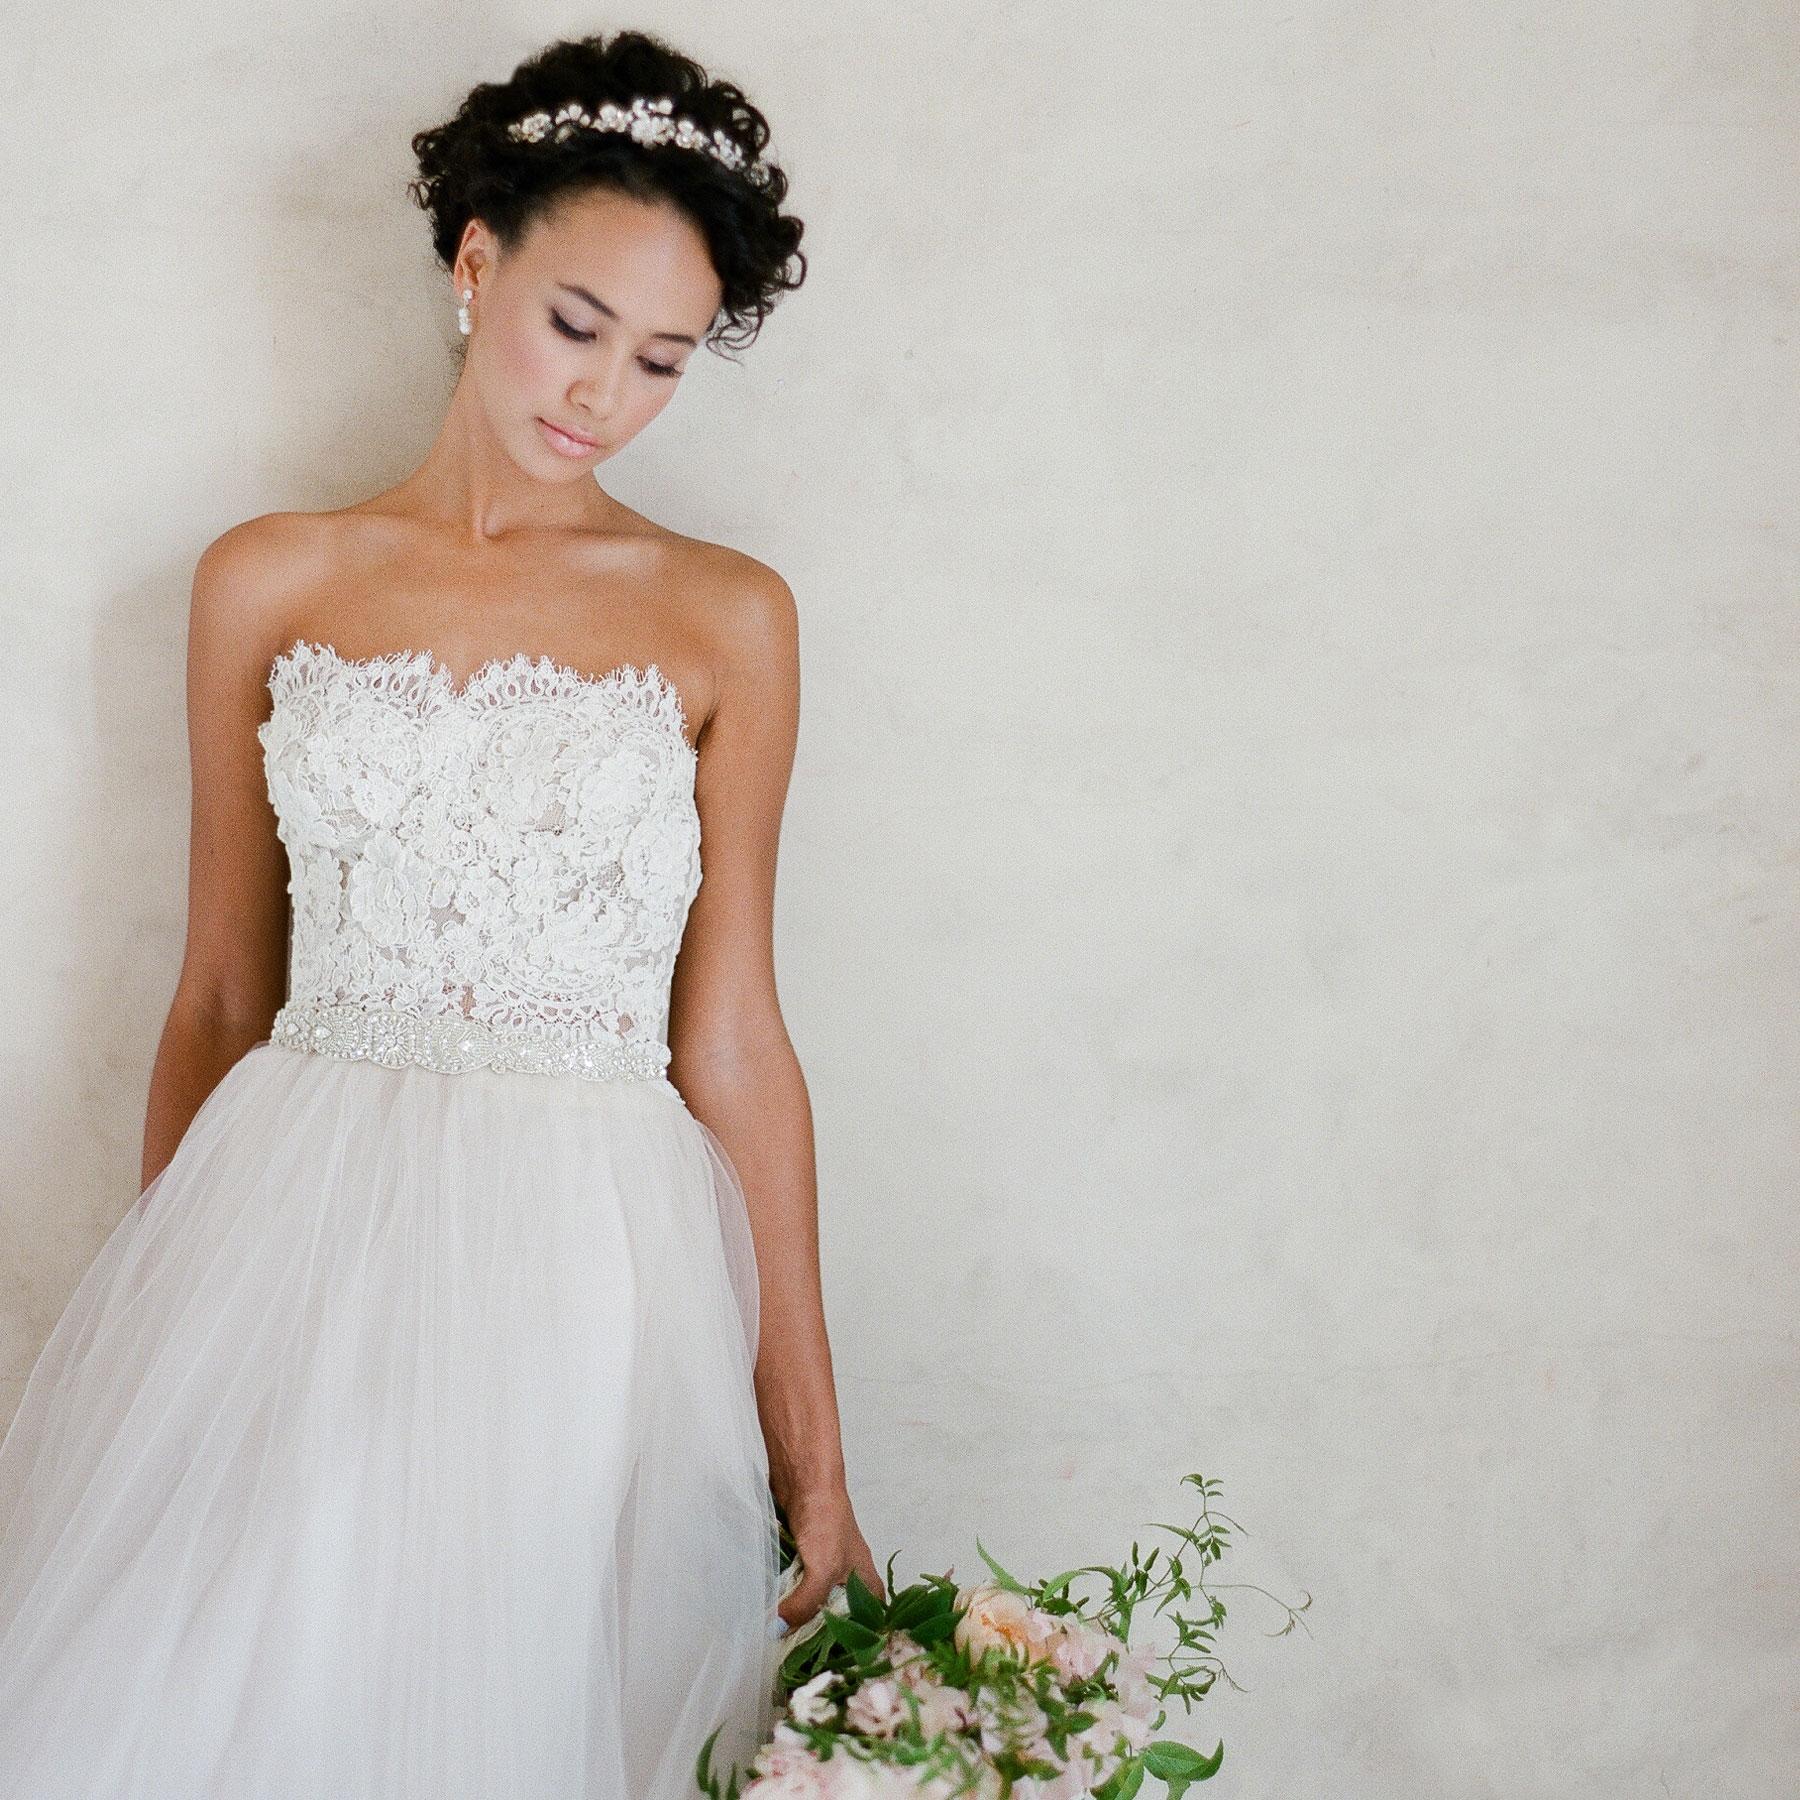 Bel Aire Bridal- Instagram Ready 02142016-3 (16).jpg